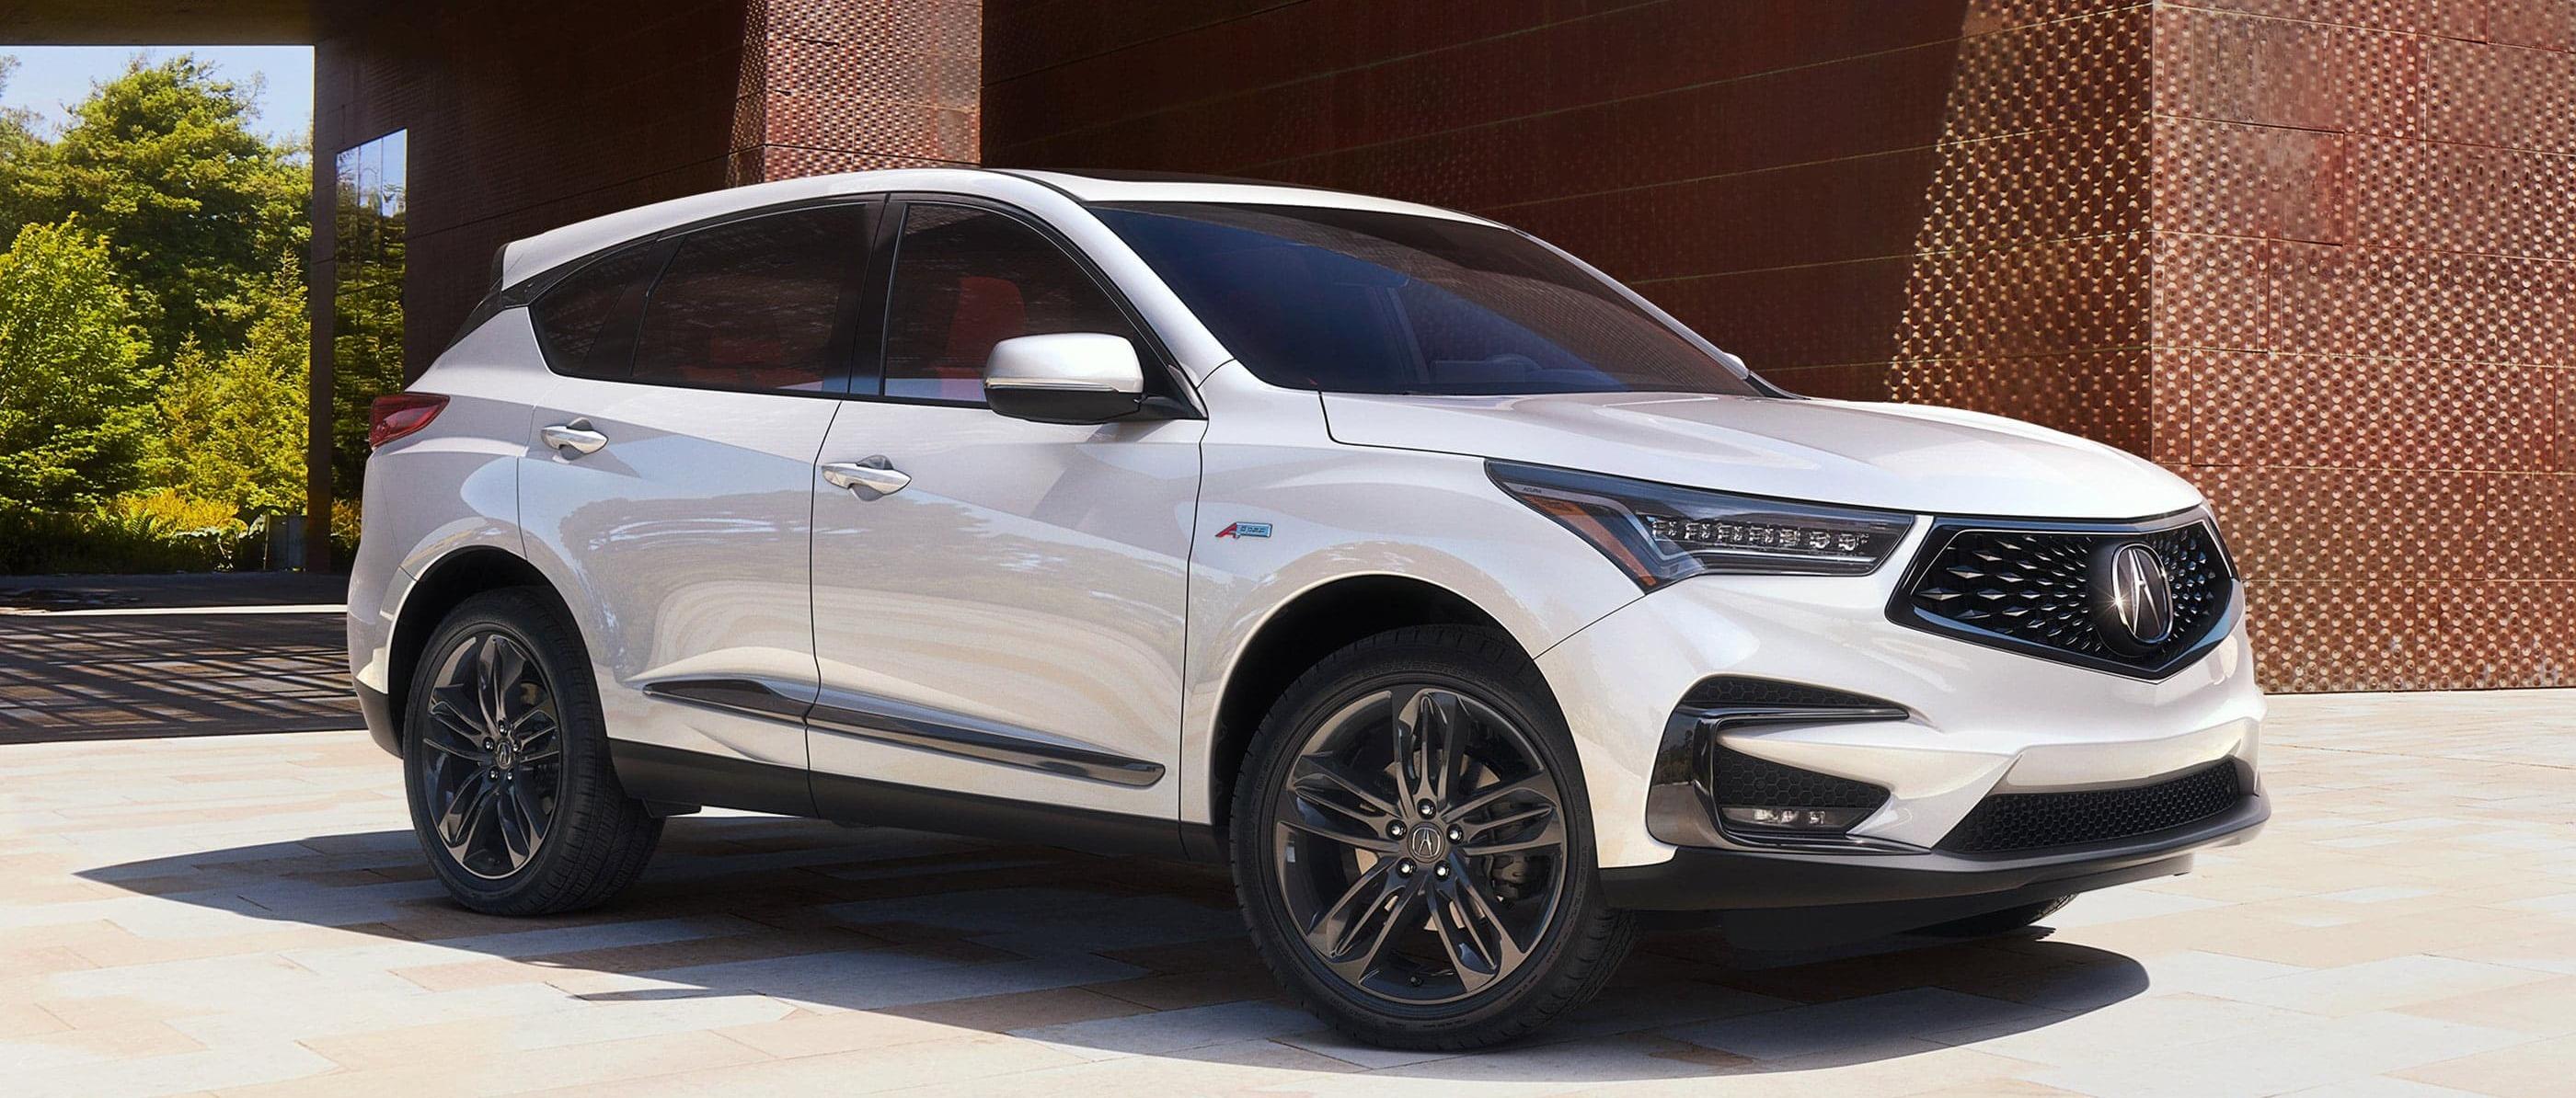 2020 Acura RDX for Sale near Millsboro, DE